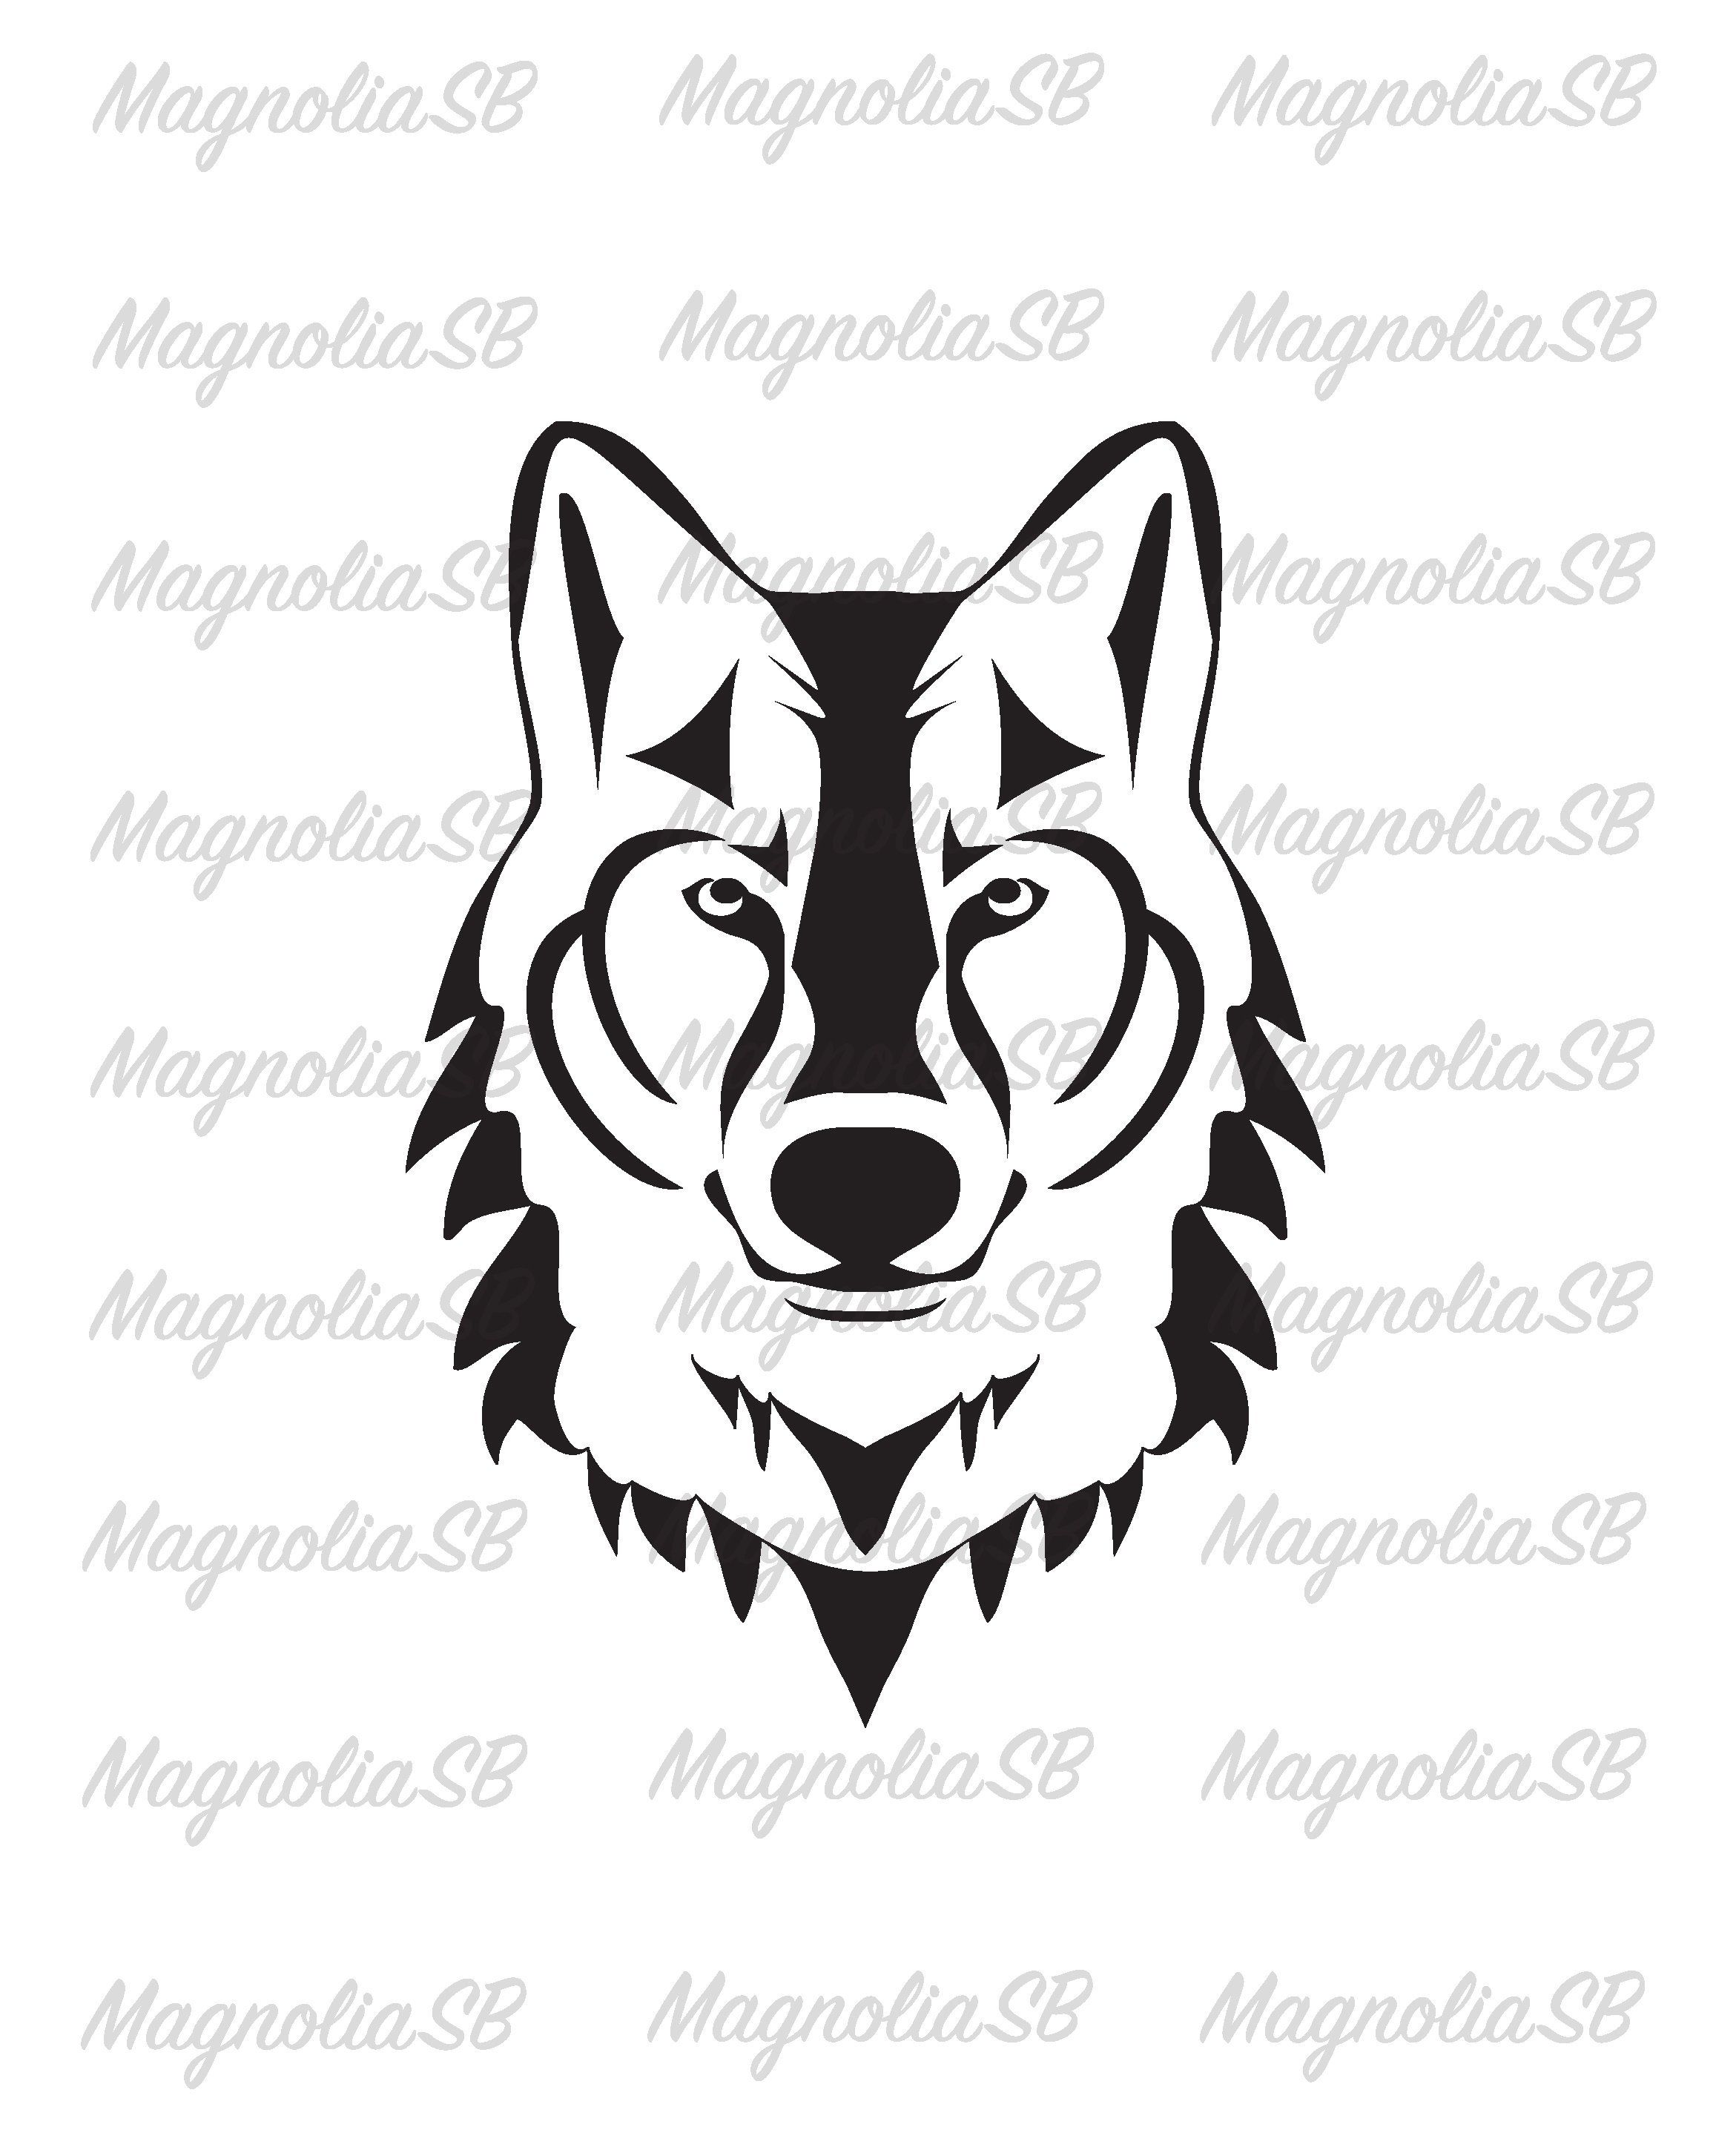 Wolf Head Silhouette Svg Wolf Dxf Wolf Silhouette Clipart Etsy Silhouette Svg Silhouette Clip Art Wolf Silhouette